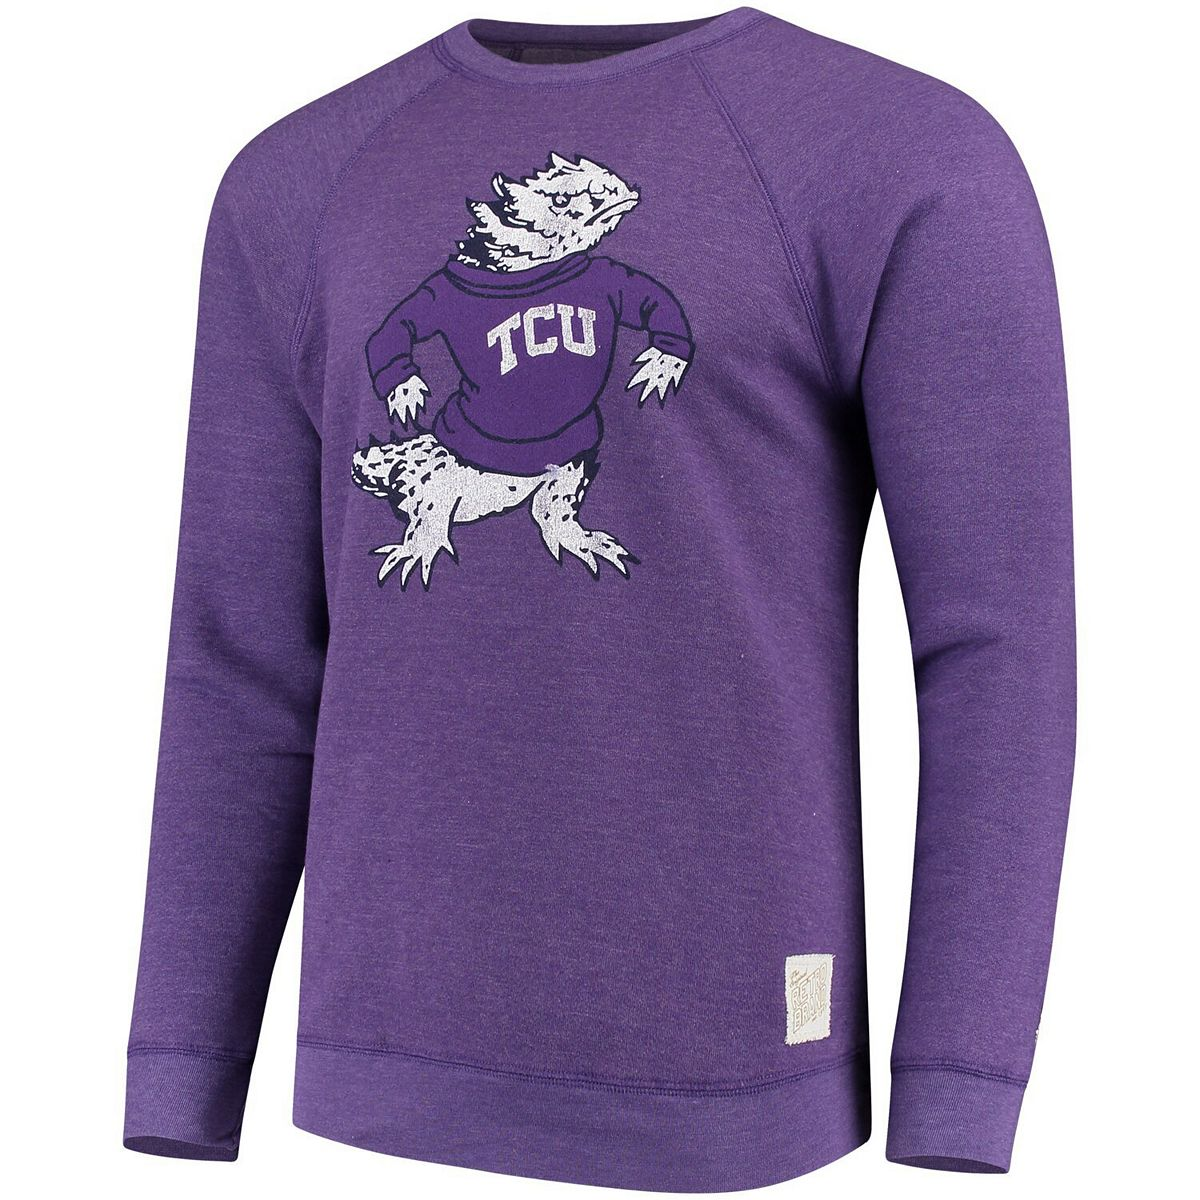 Men's Original Retro Brand Heathered Purple TCU Horned Frogs School Logo Tri-Blend Pullover Sweatshirt zFxLr